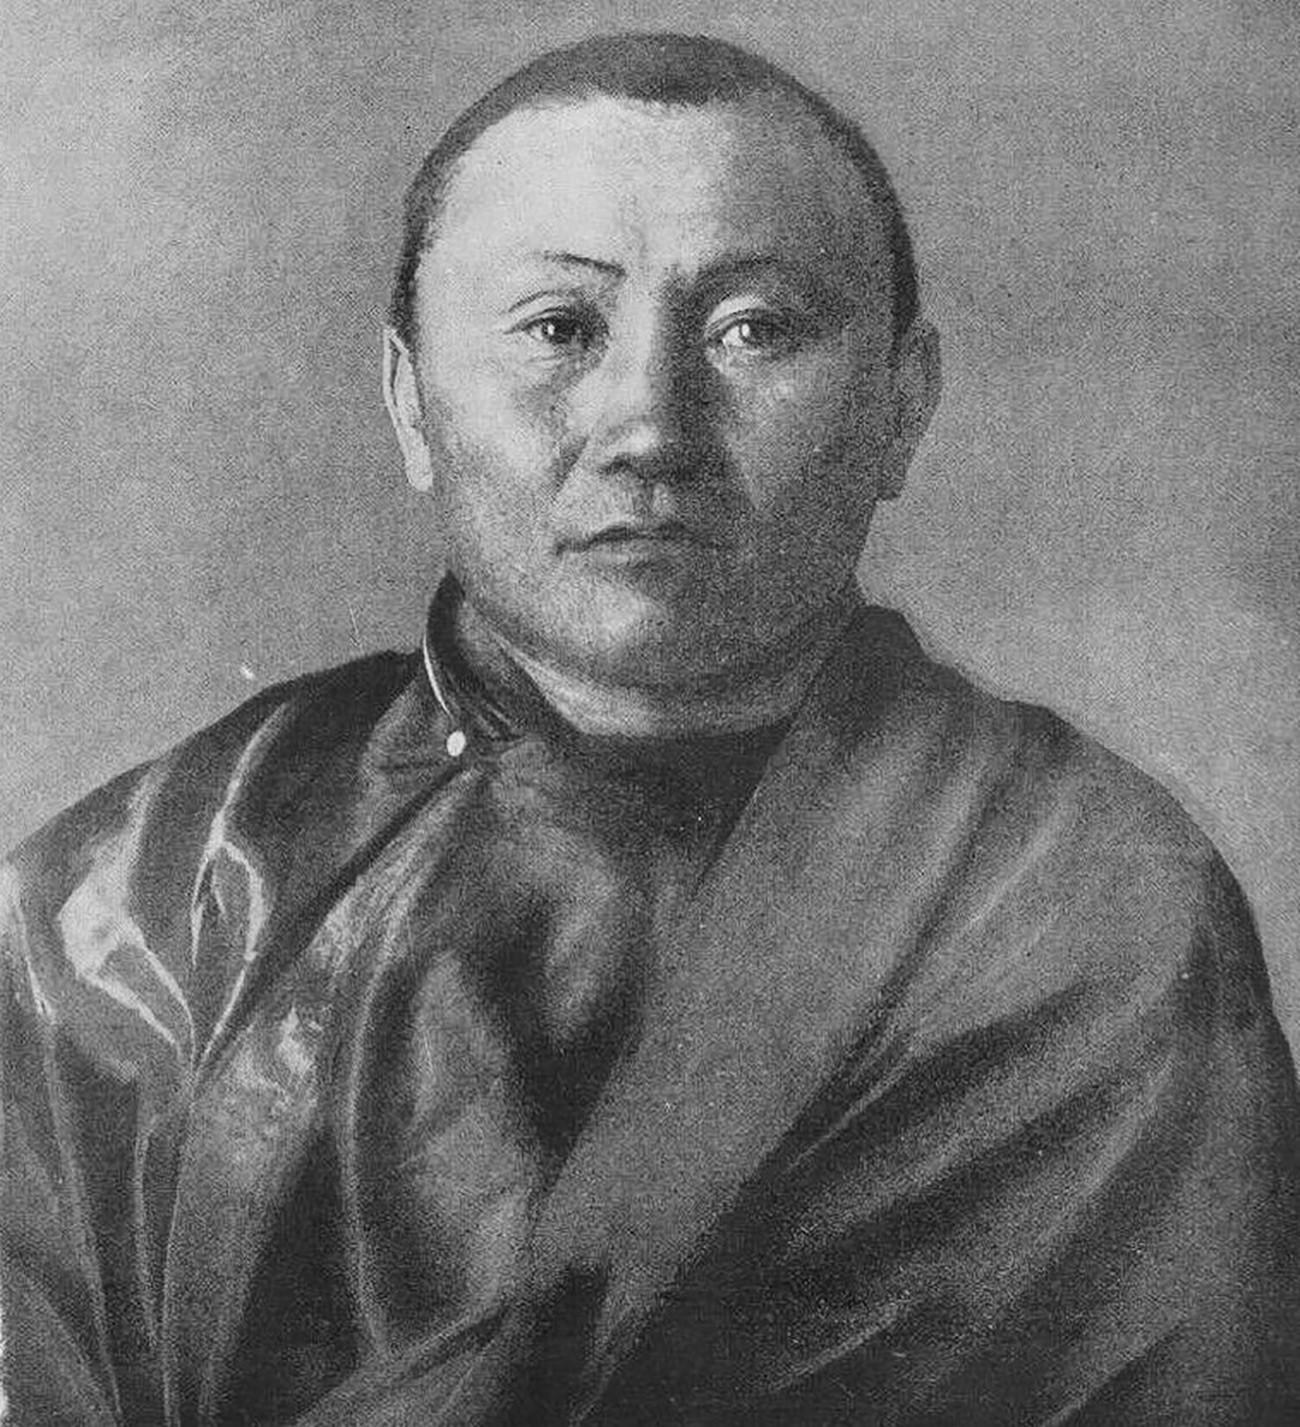 Agvan Dorjiev en 1899